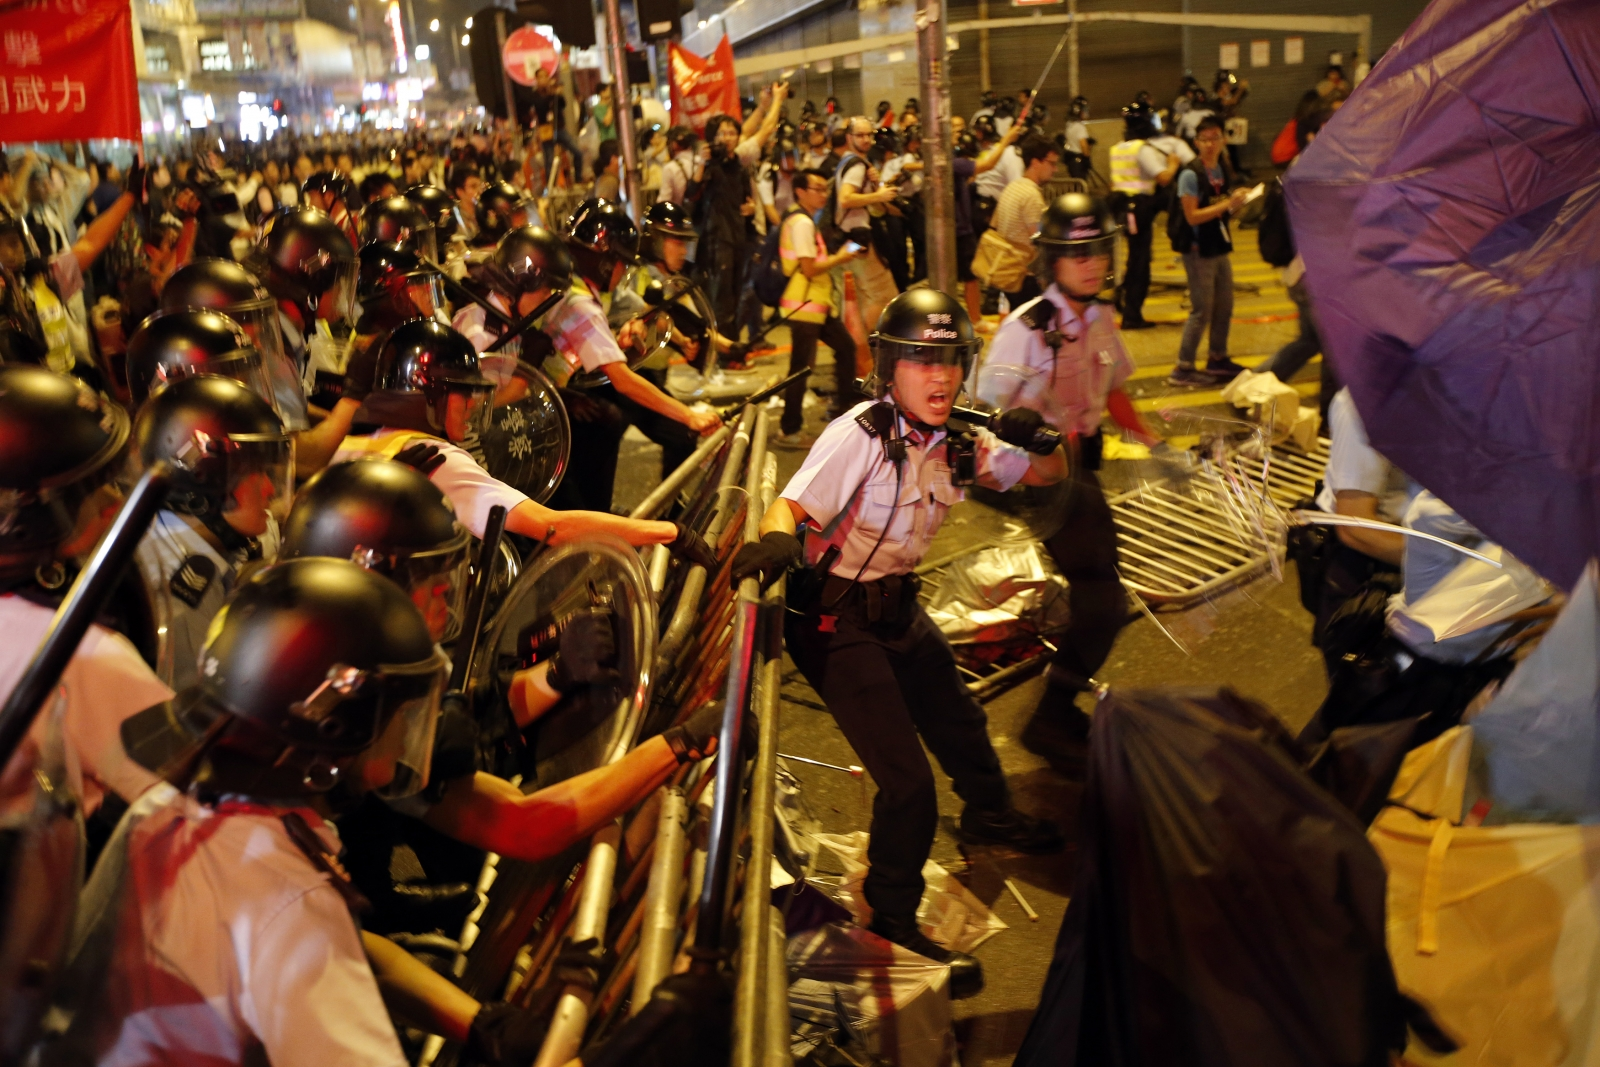 Hong Kong Protests: 20 Demonstrators Injured In Fourth